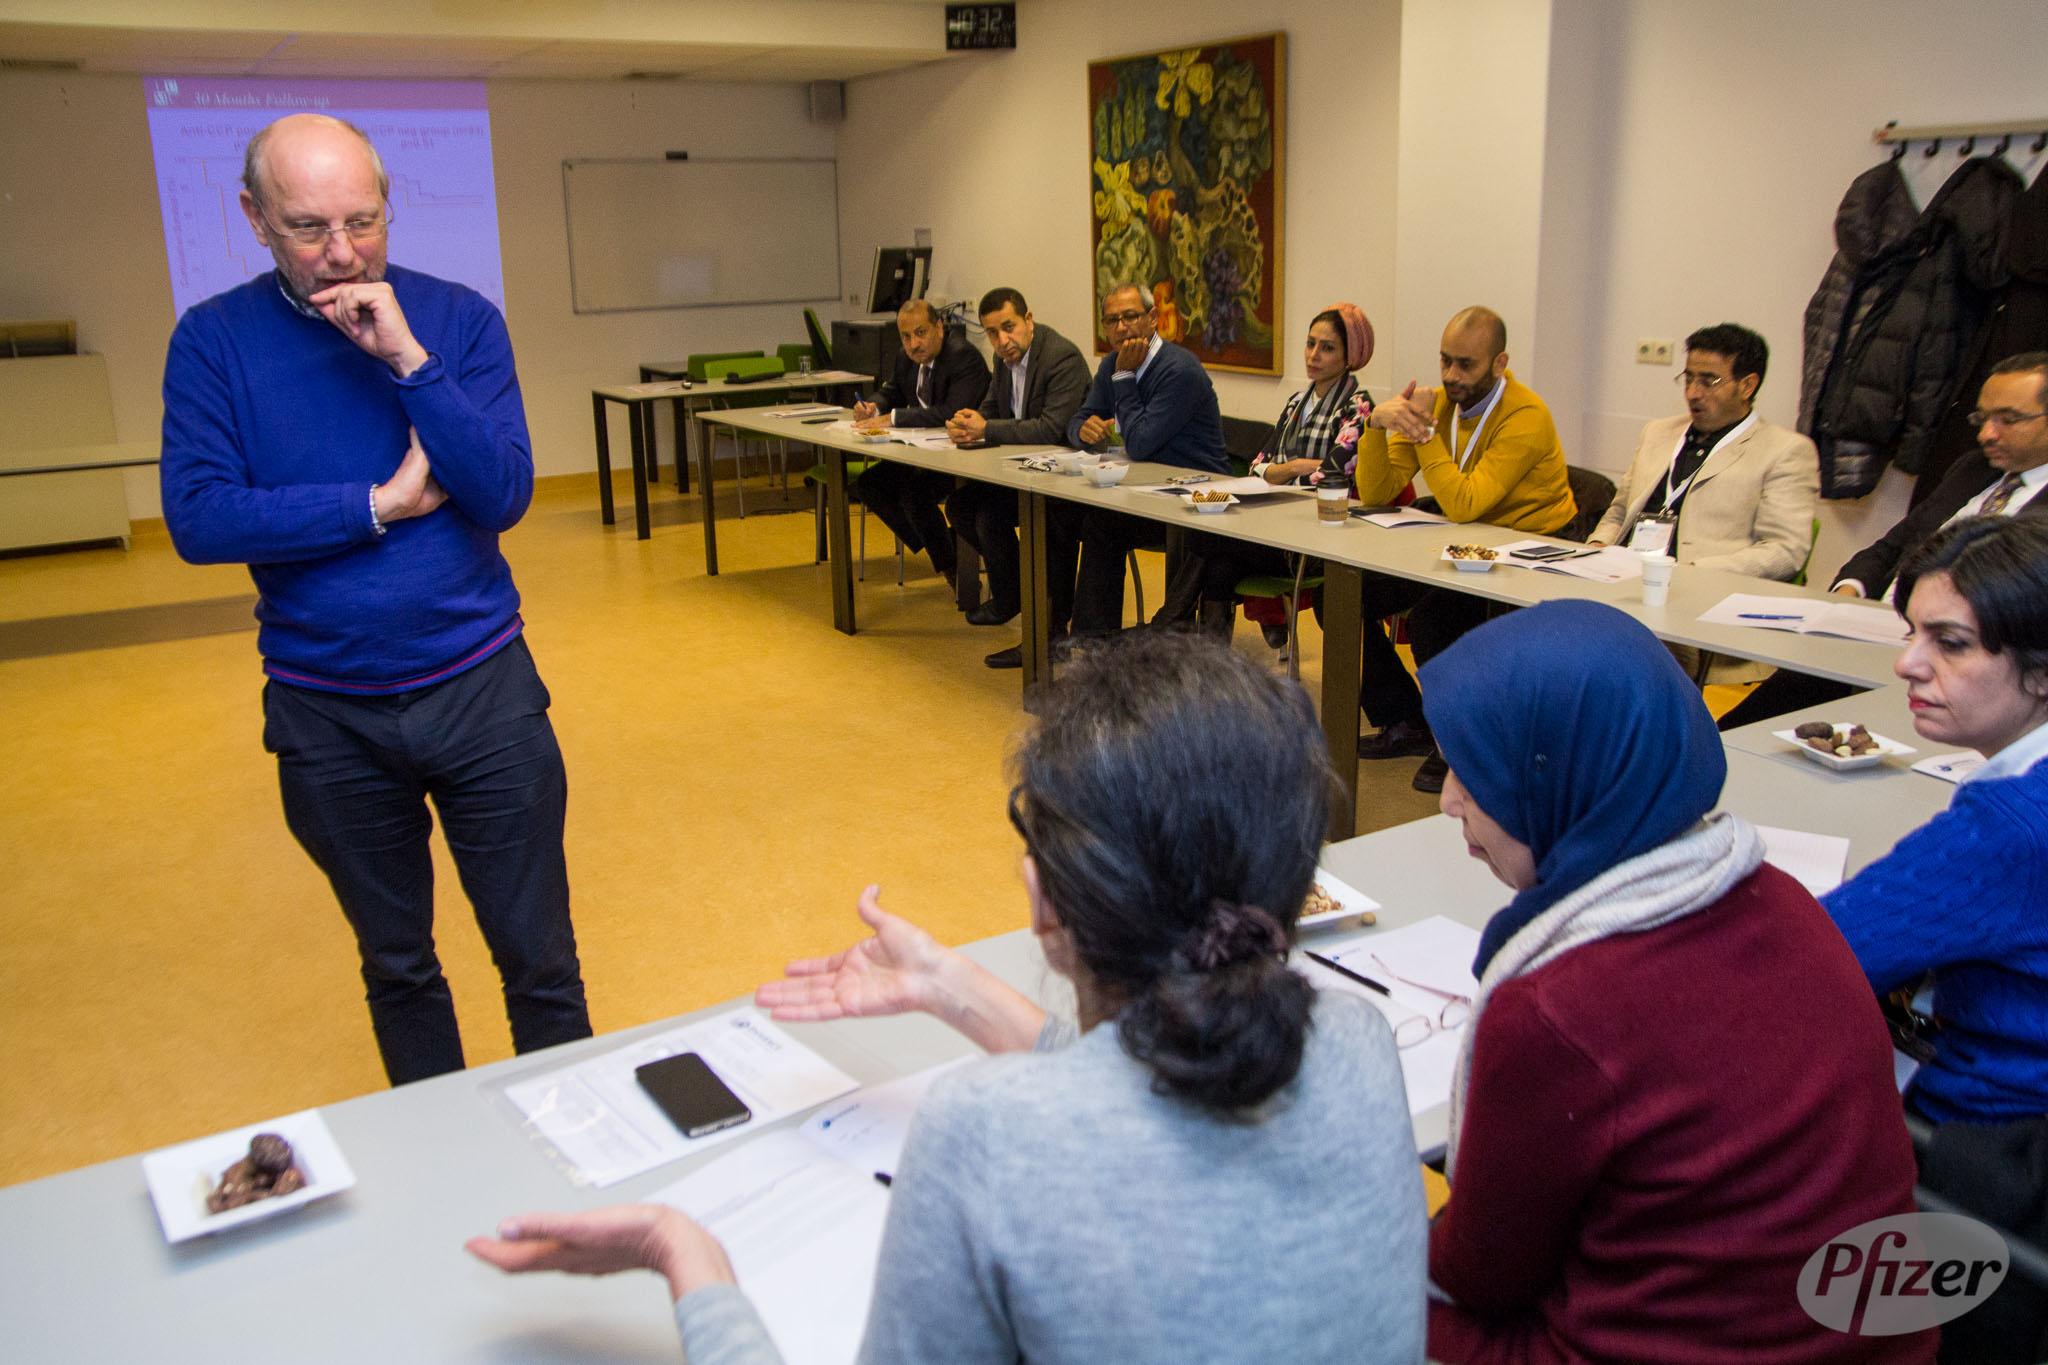 Leiden Doctor's seminar photographer